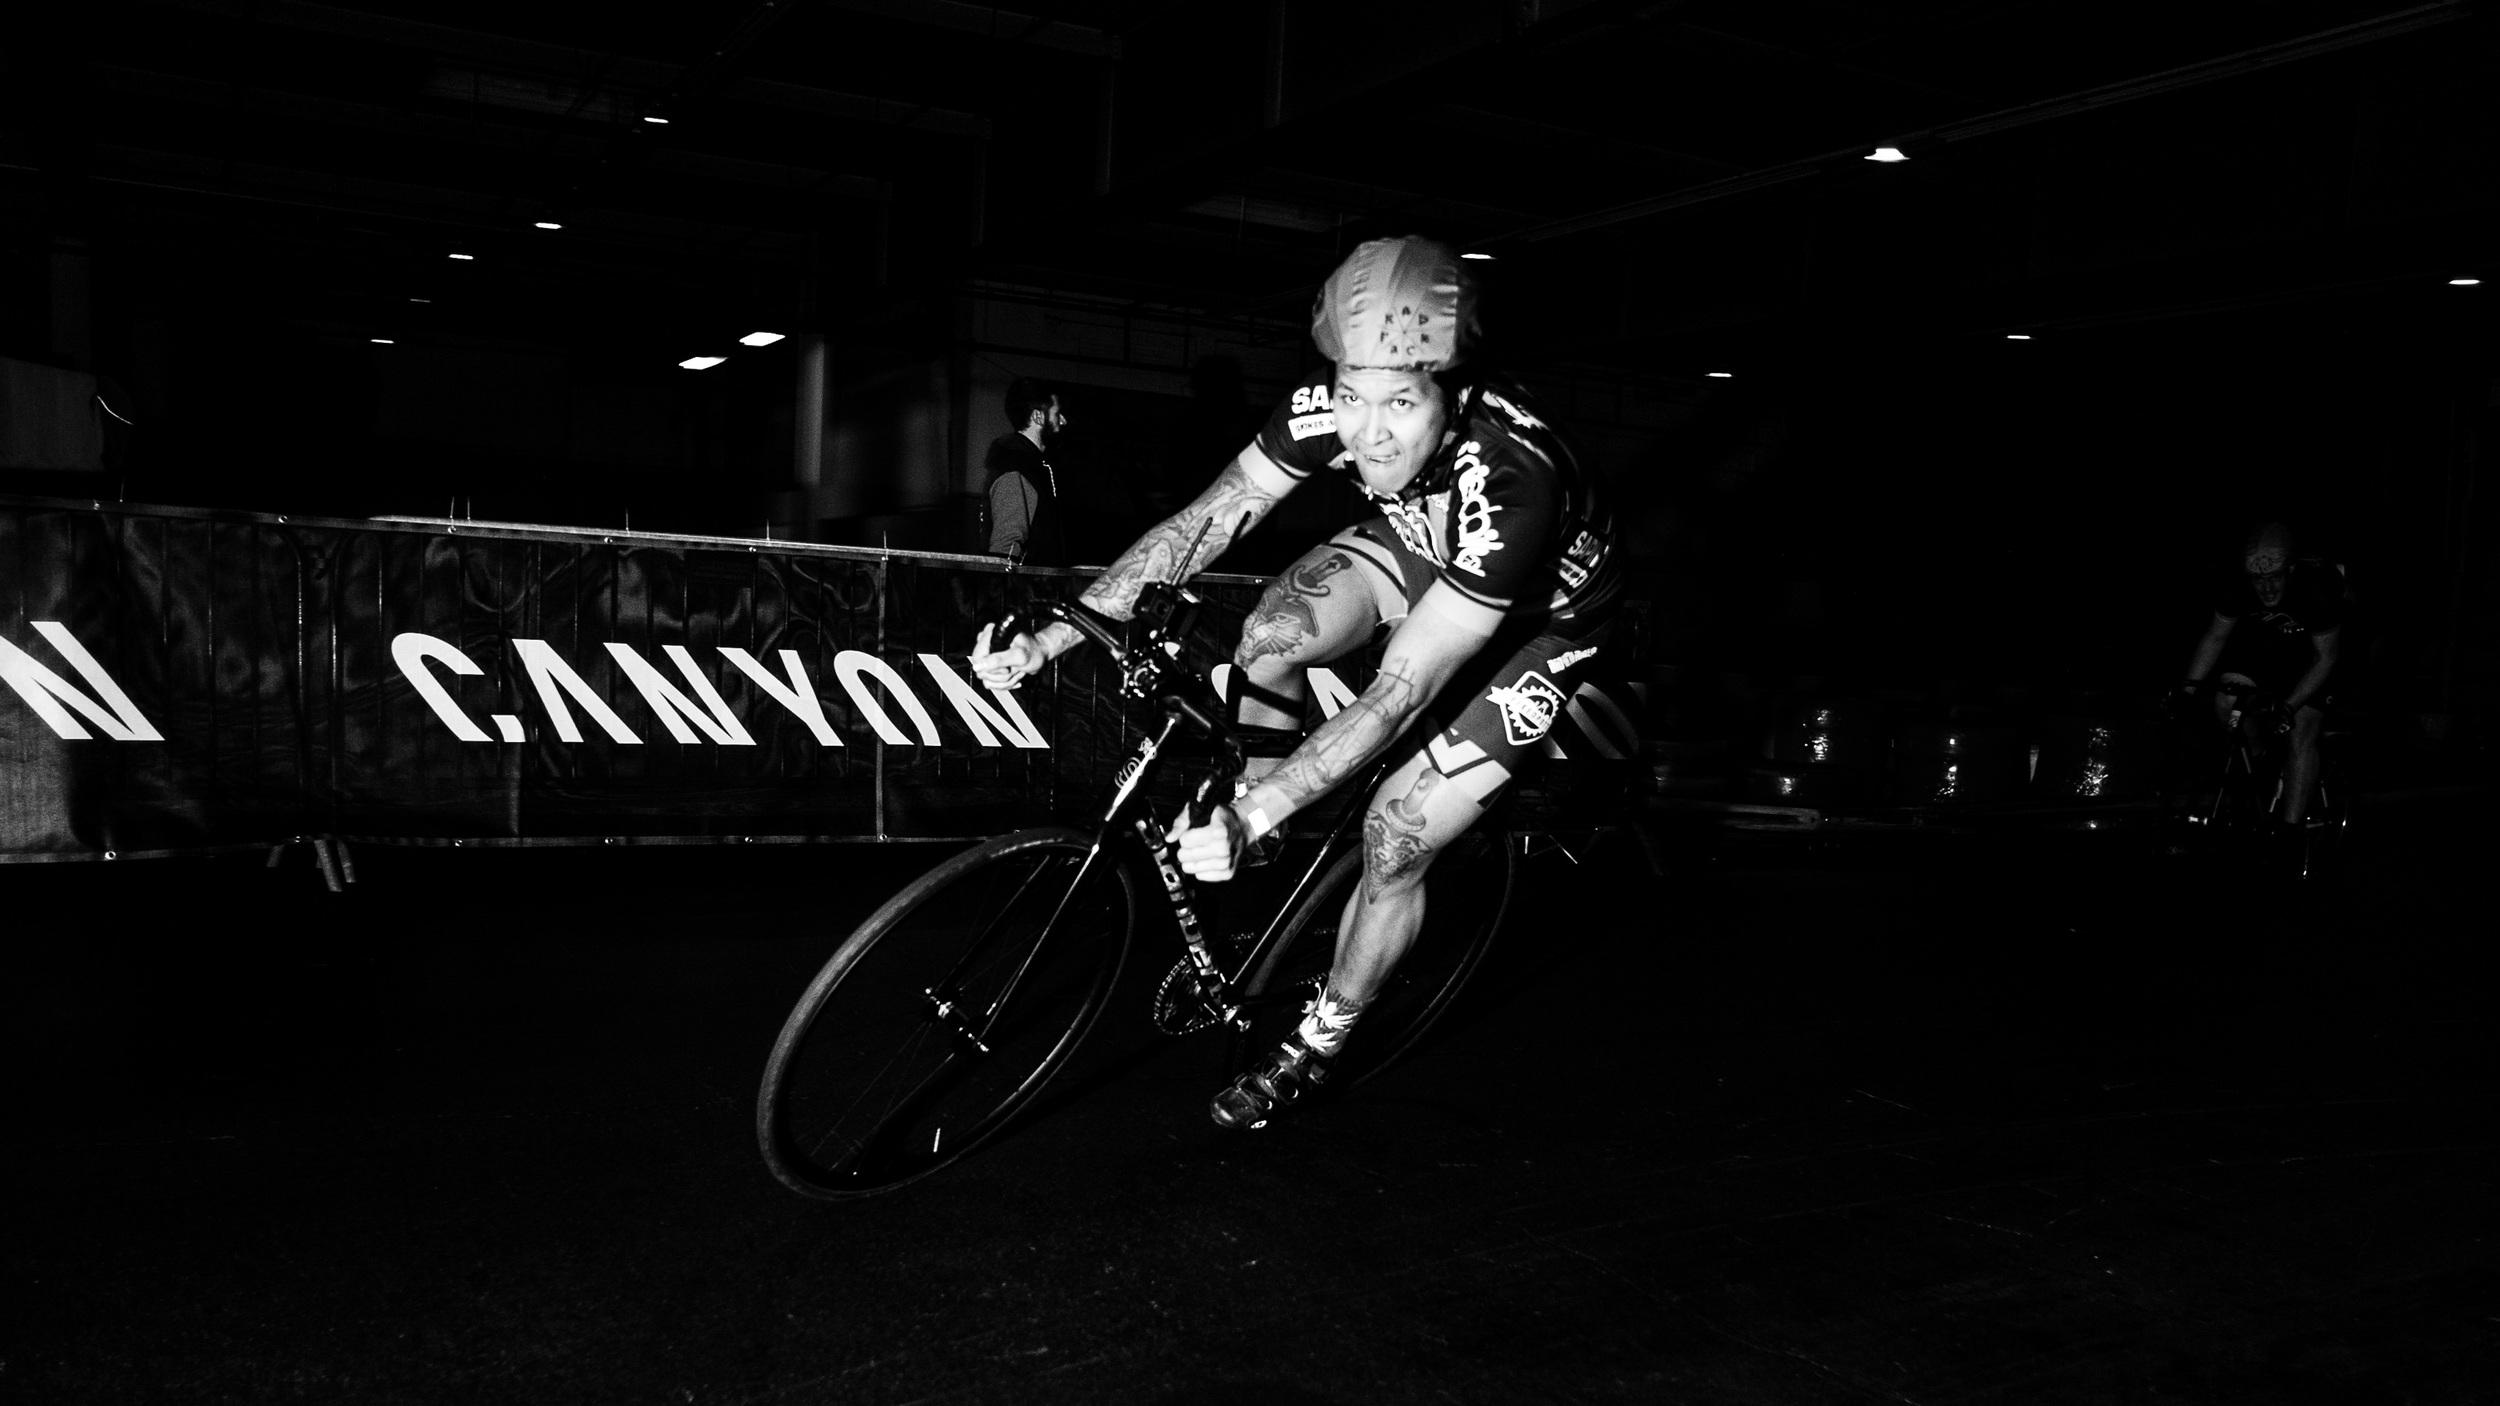 RAD RACE Last Man Standing, Berlin March 19 2016 - Shot by Drew Kaplan 32.jpg